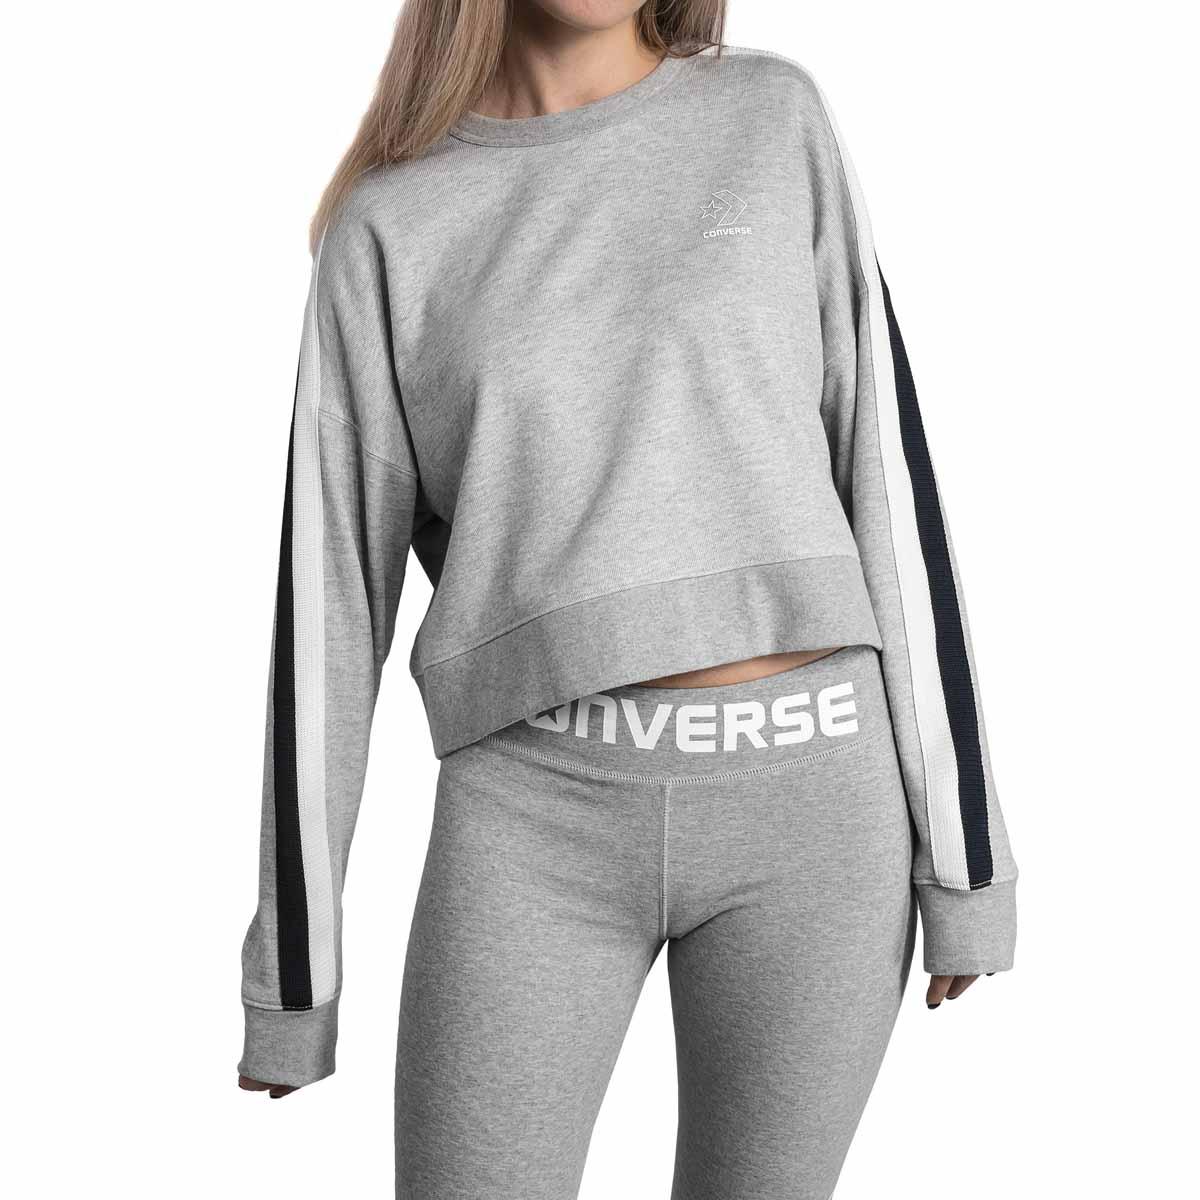 Купить Свитшот женский Converse Star Chervon Track Cropped Crew, цвет: серый. 10005758035. Размер XS (42)